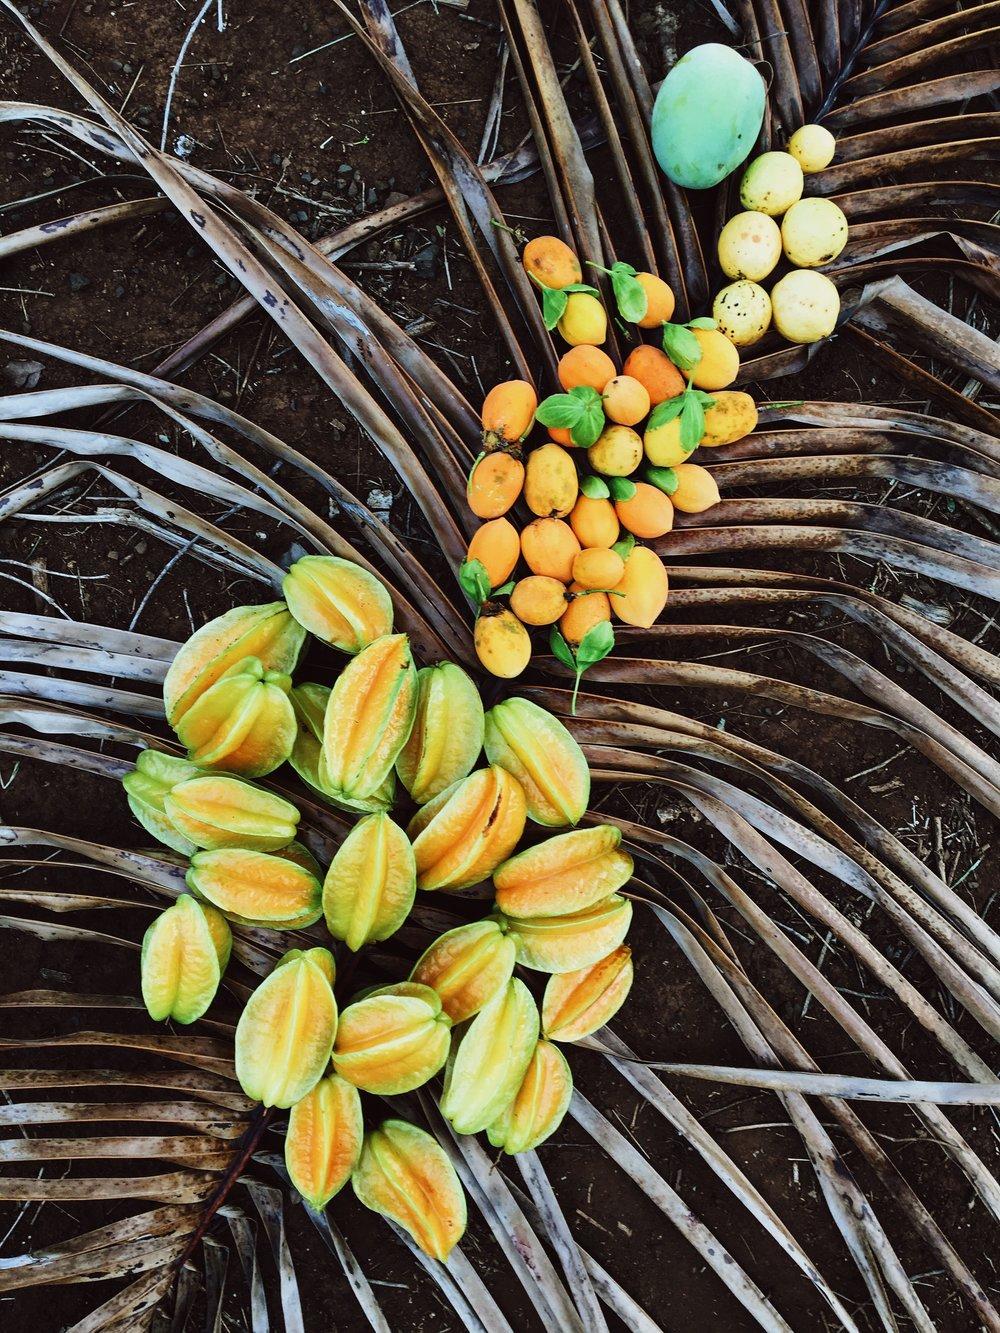 Startfruit. Lilikoi. Guava. Mango. Kauai, Hawaii.